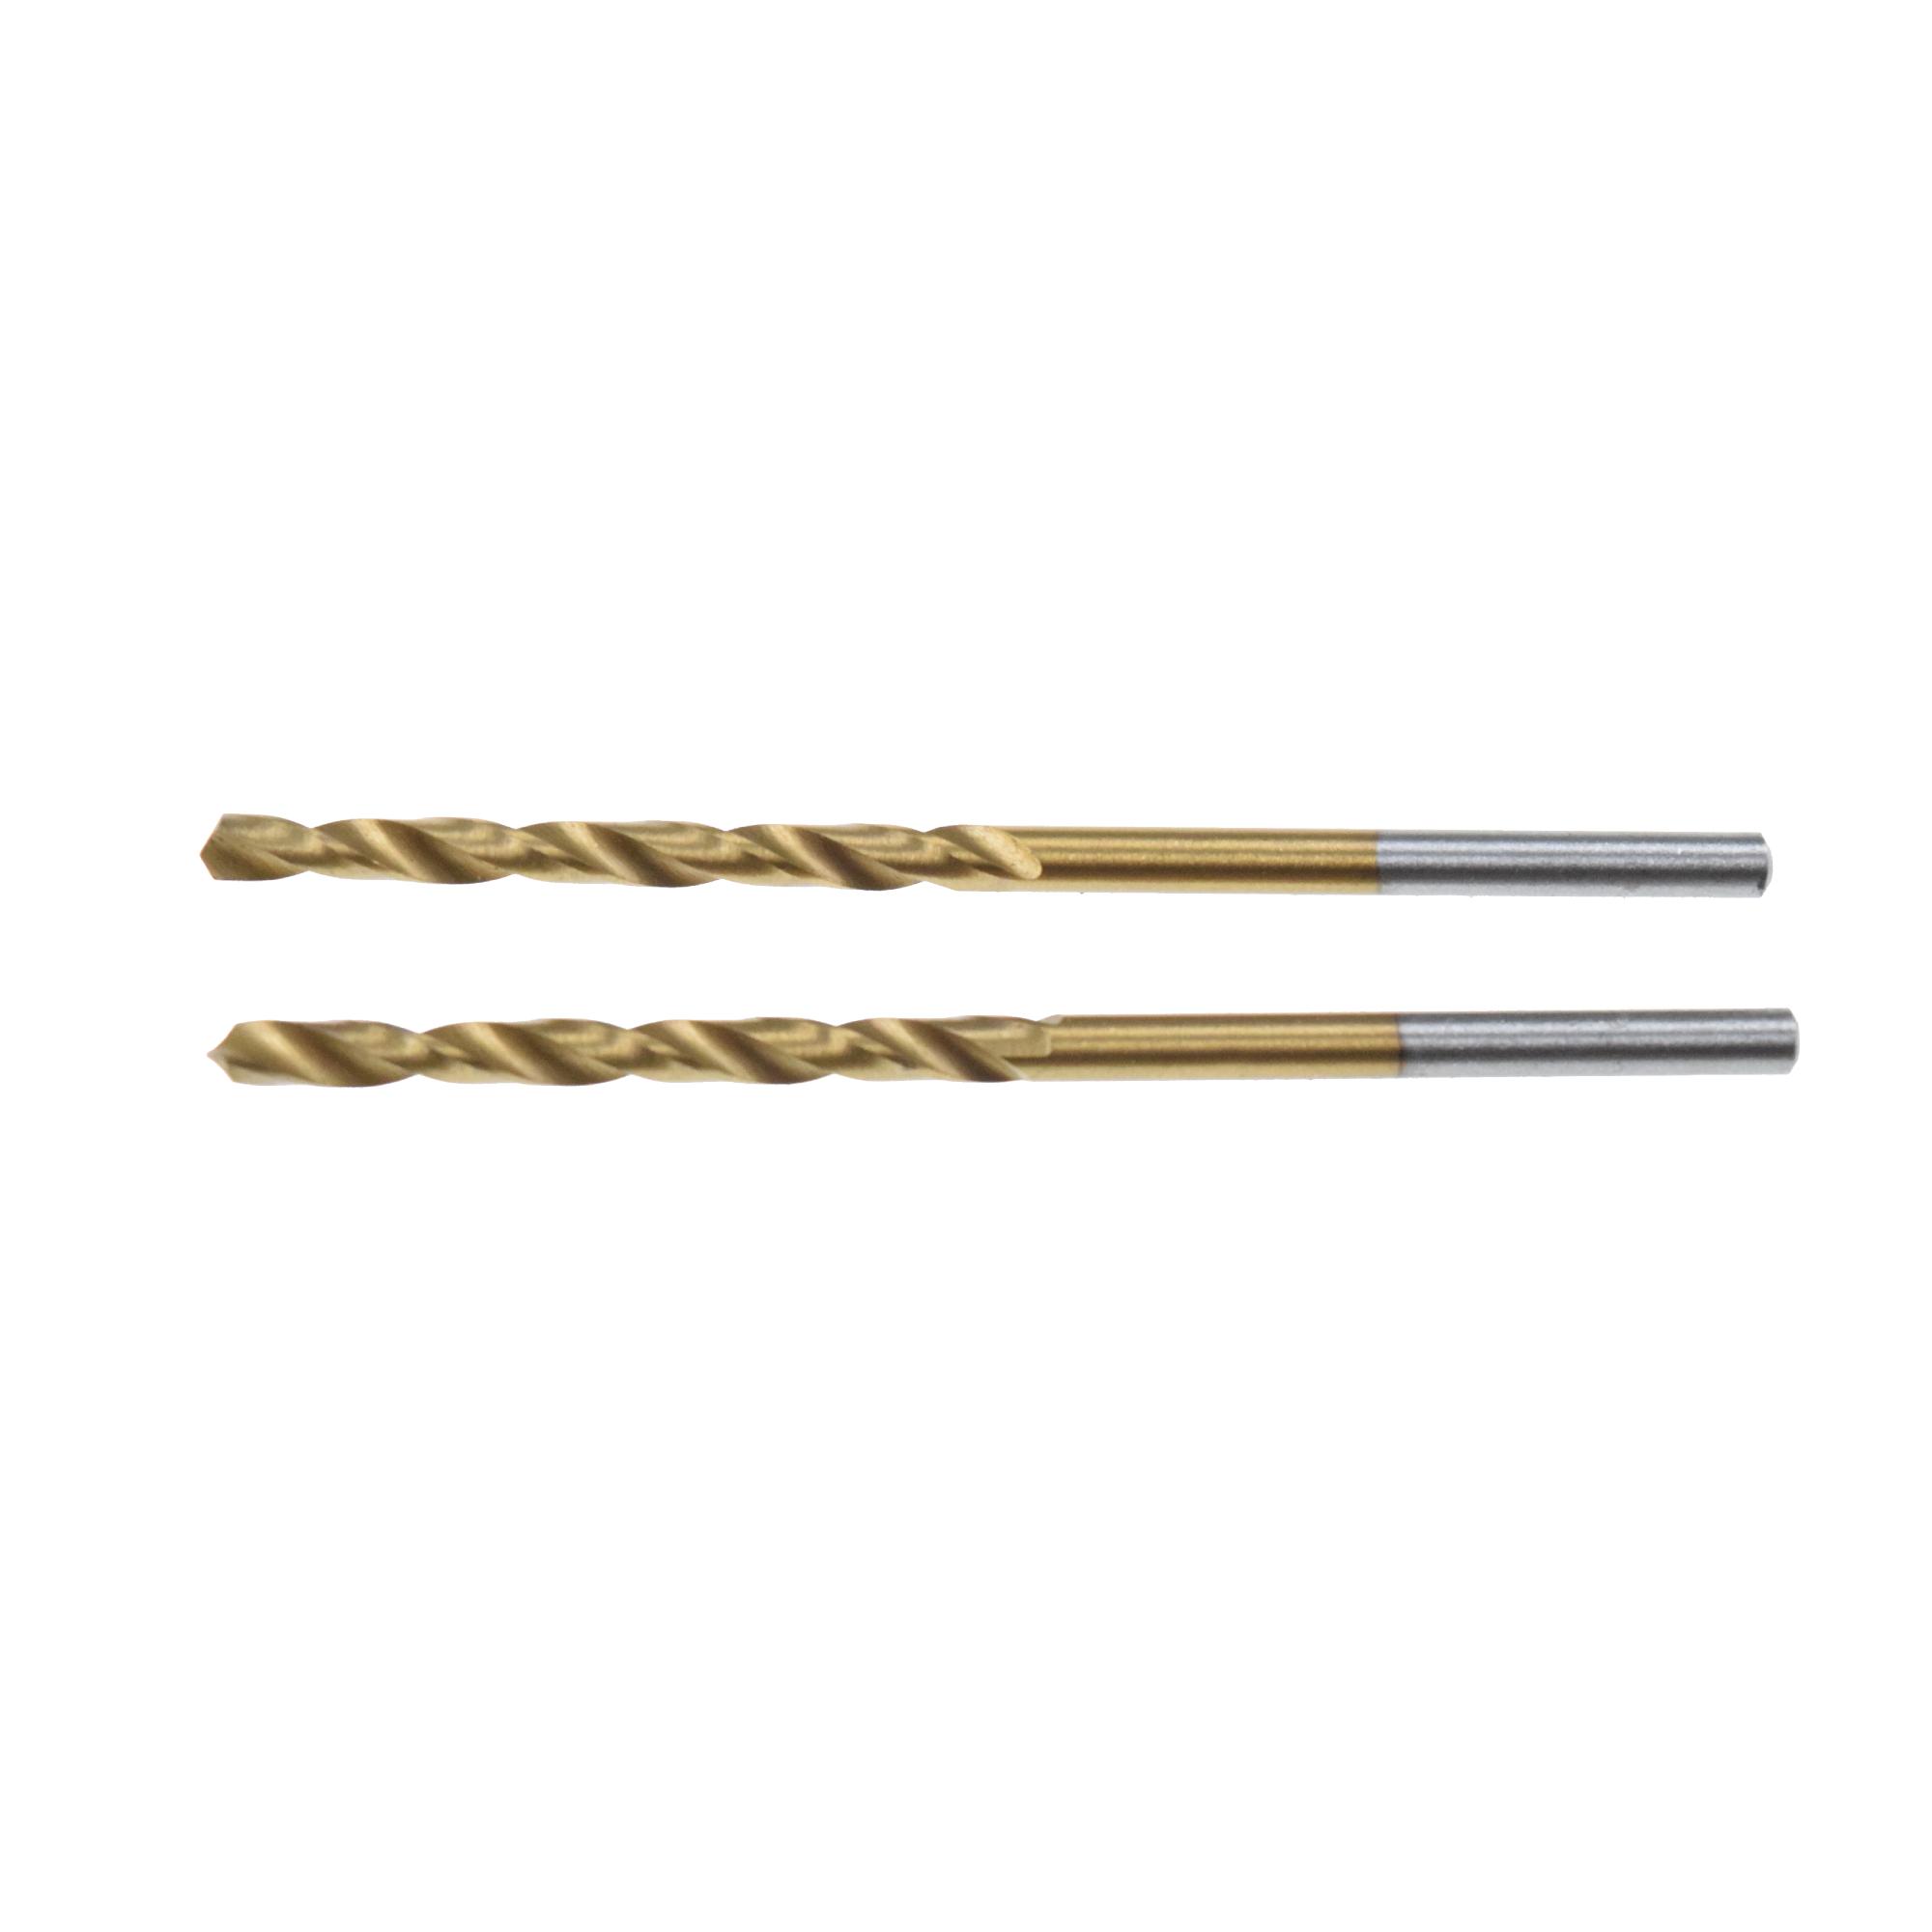 Set 2 bucati burghie pentru metal HSS Titan marca Irwin de 1 x 12 x 34 mm